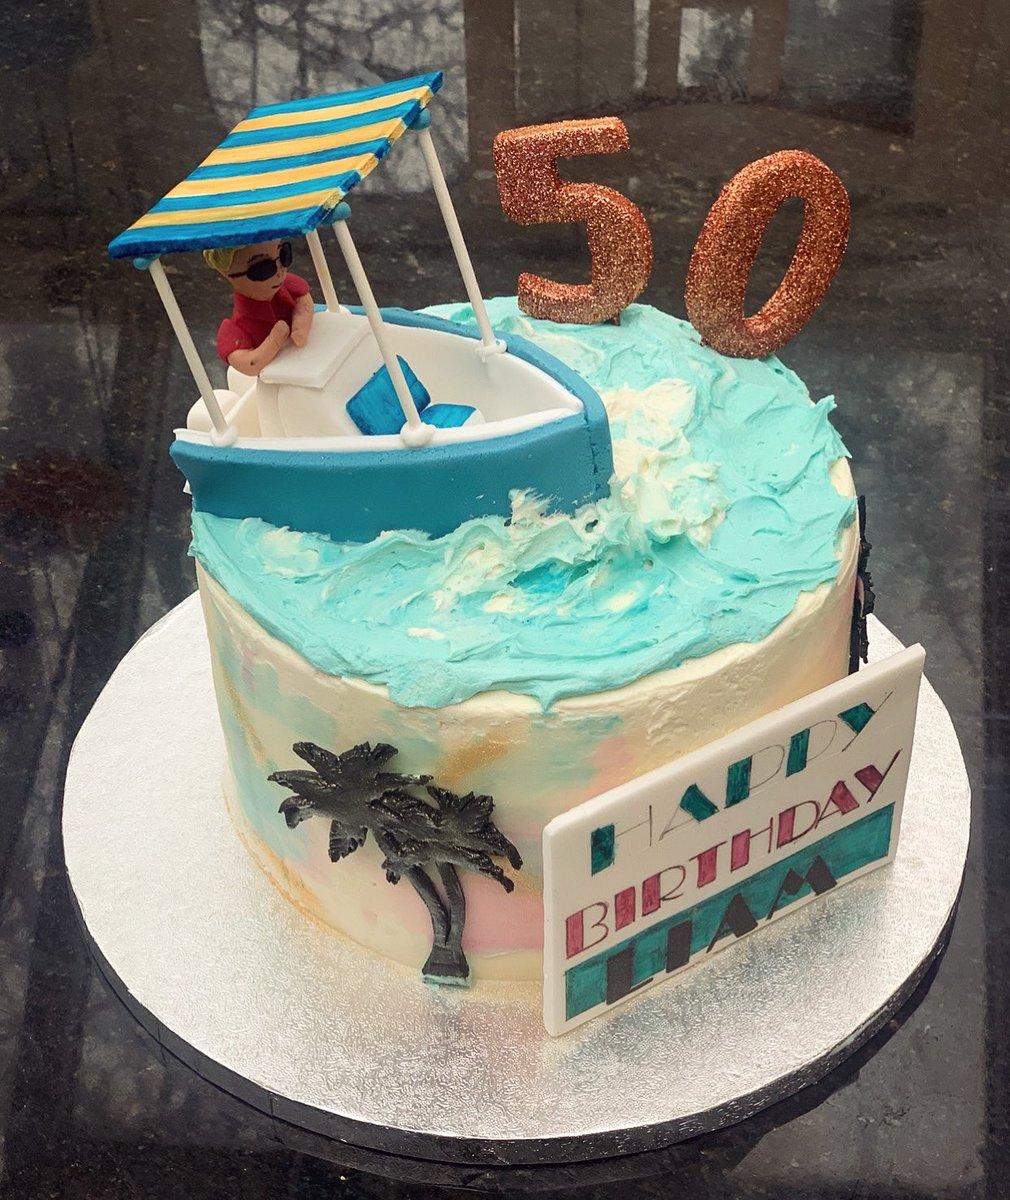 Enjoyable Cakes By Chlobo On Twitter A Miami Vice Inspired 50Th Birthday Funny Birthday Cards Online Hendilapandamsfinfo